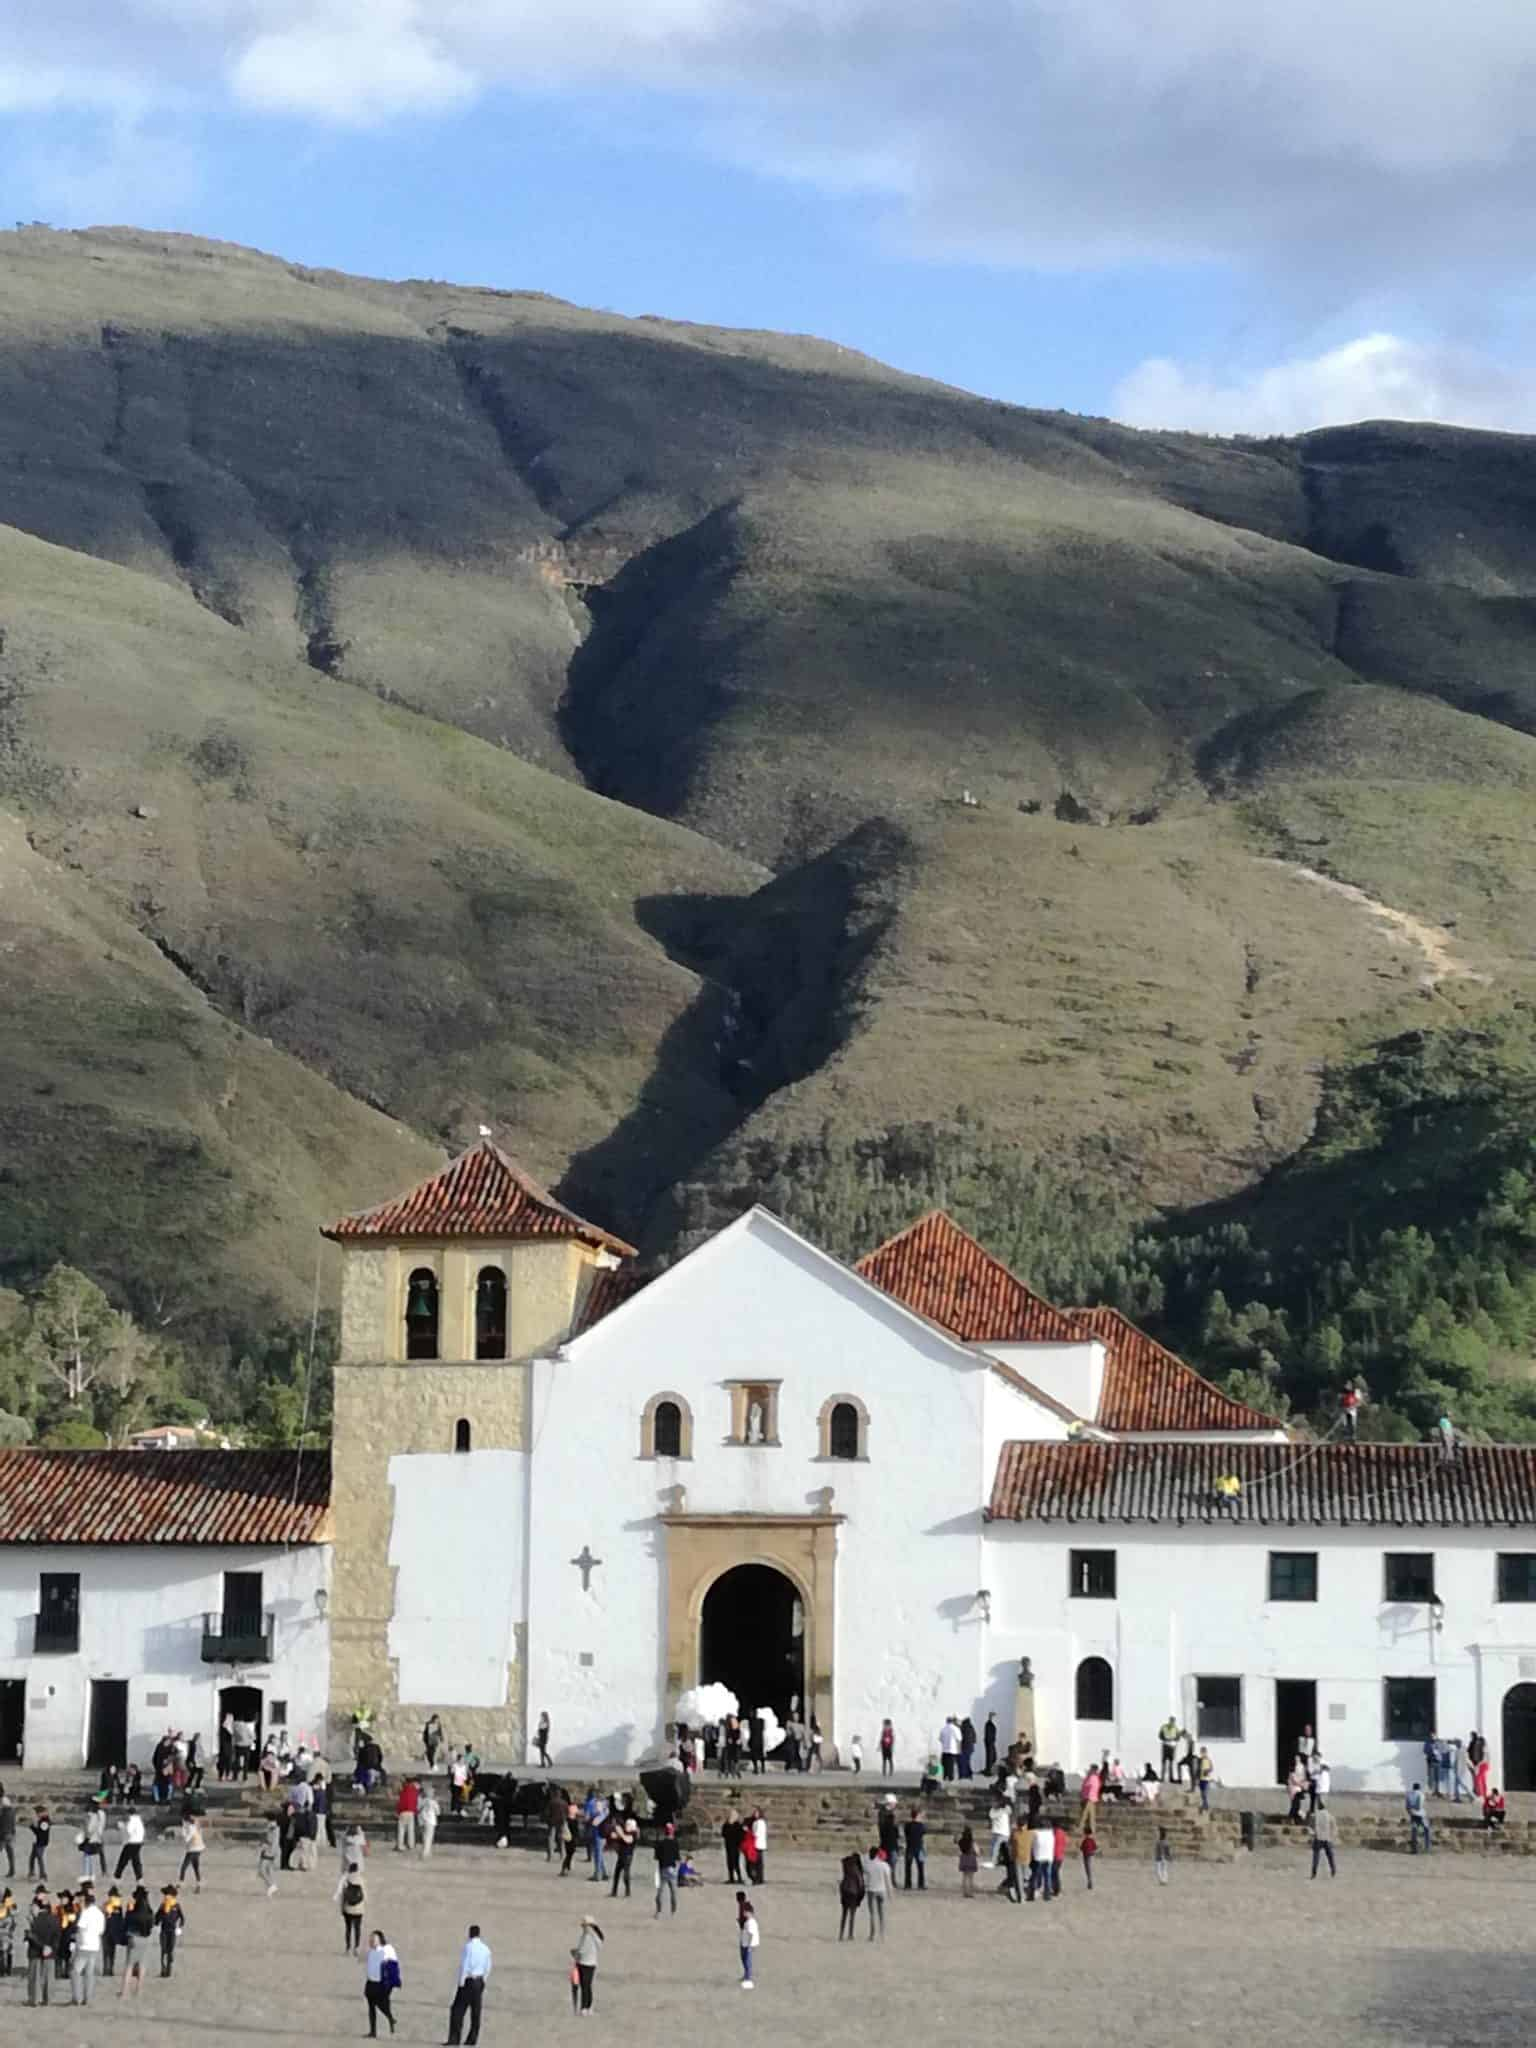 Main Square, Villa de Leyva